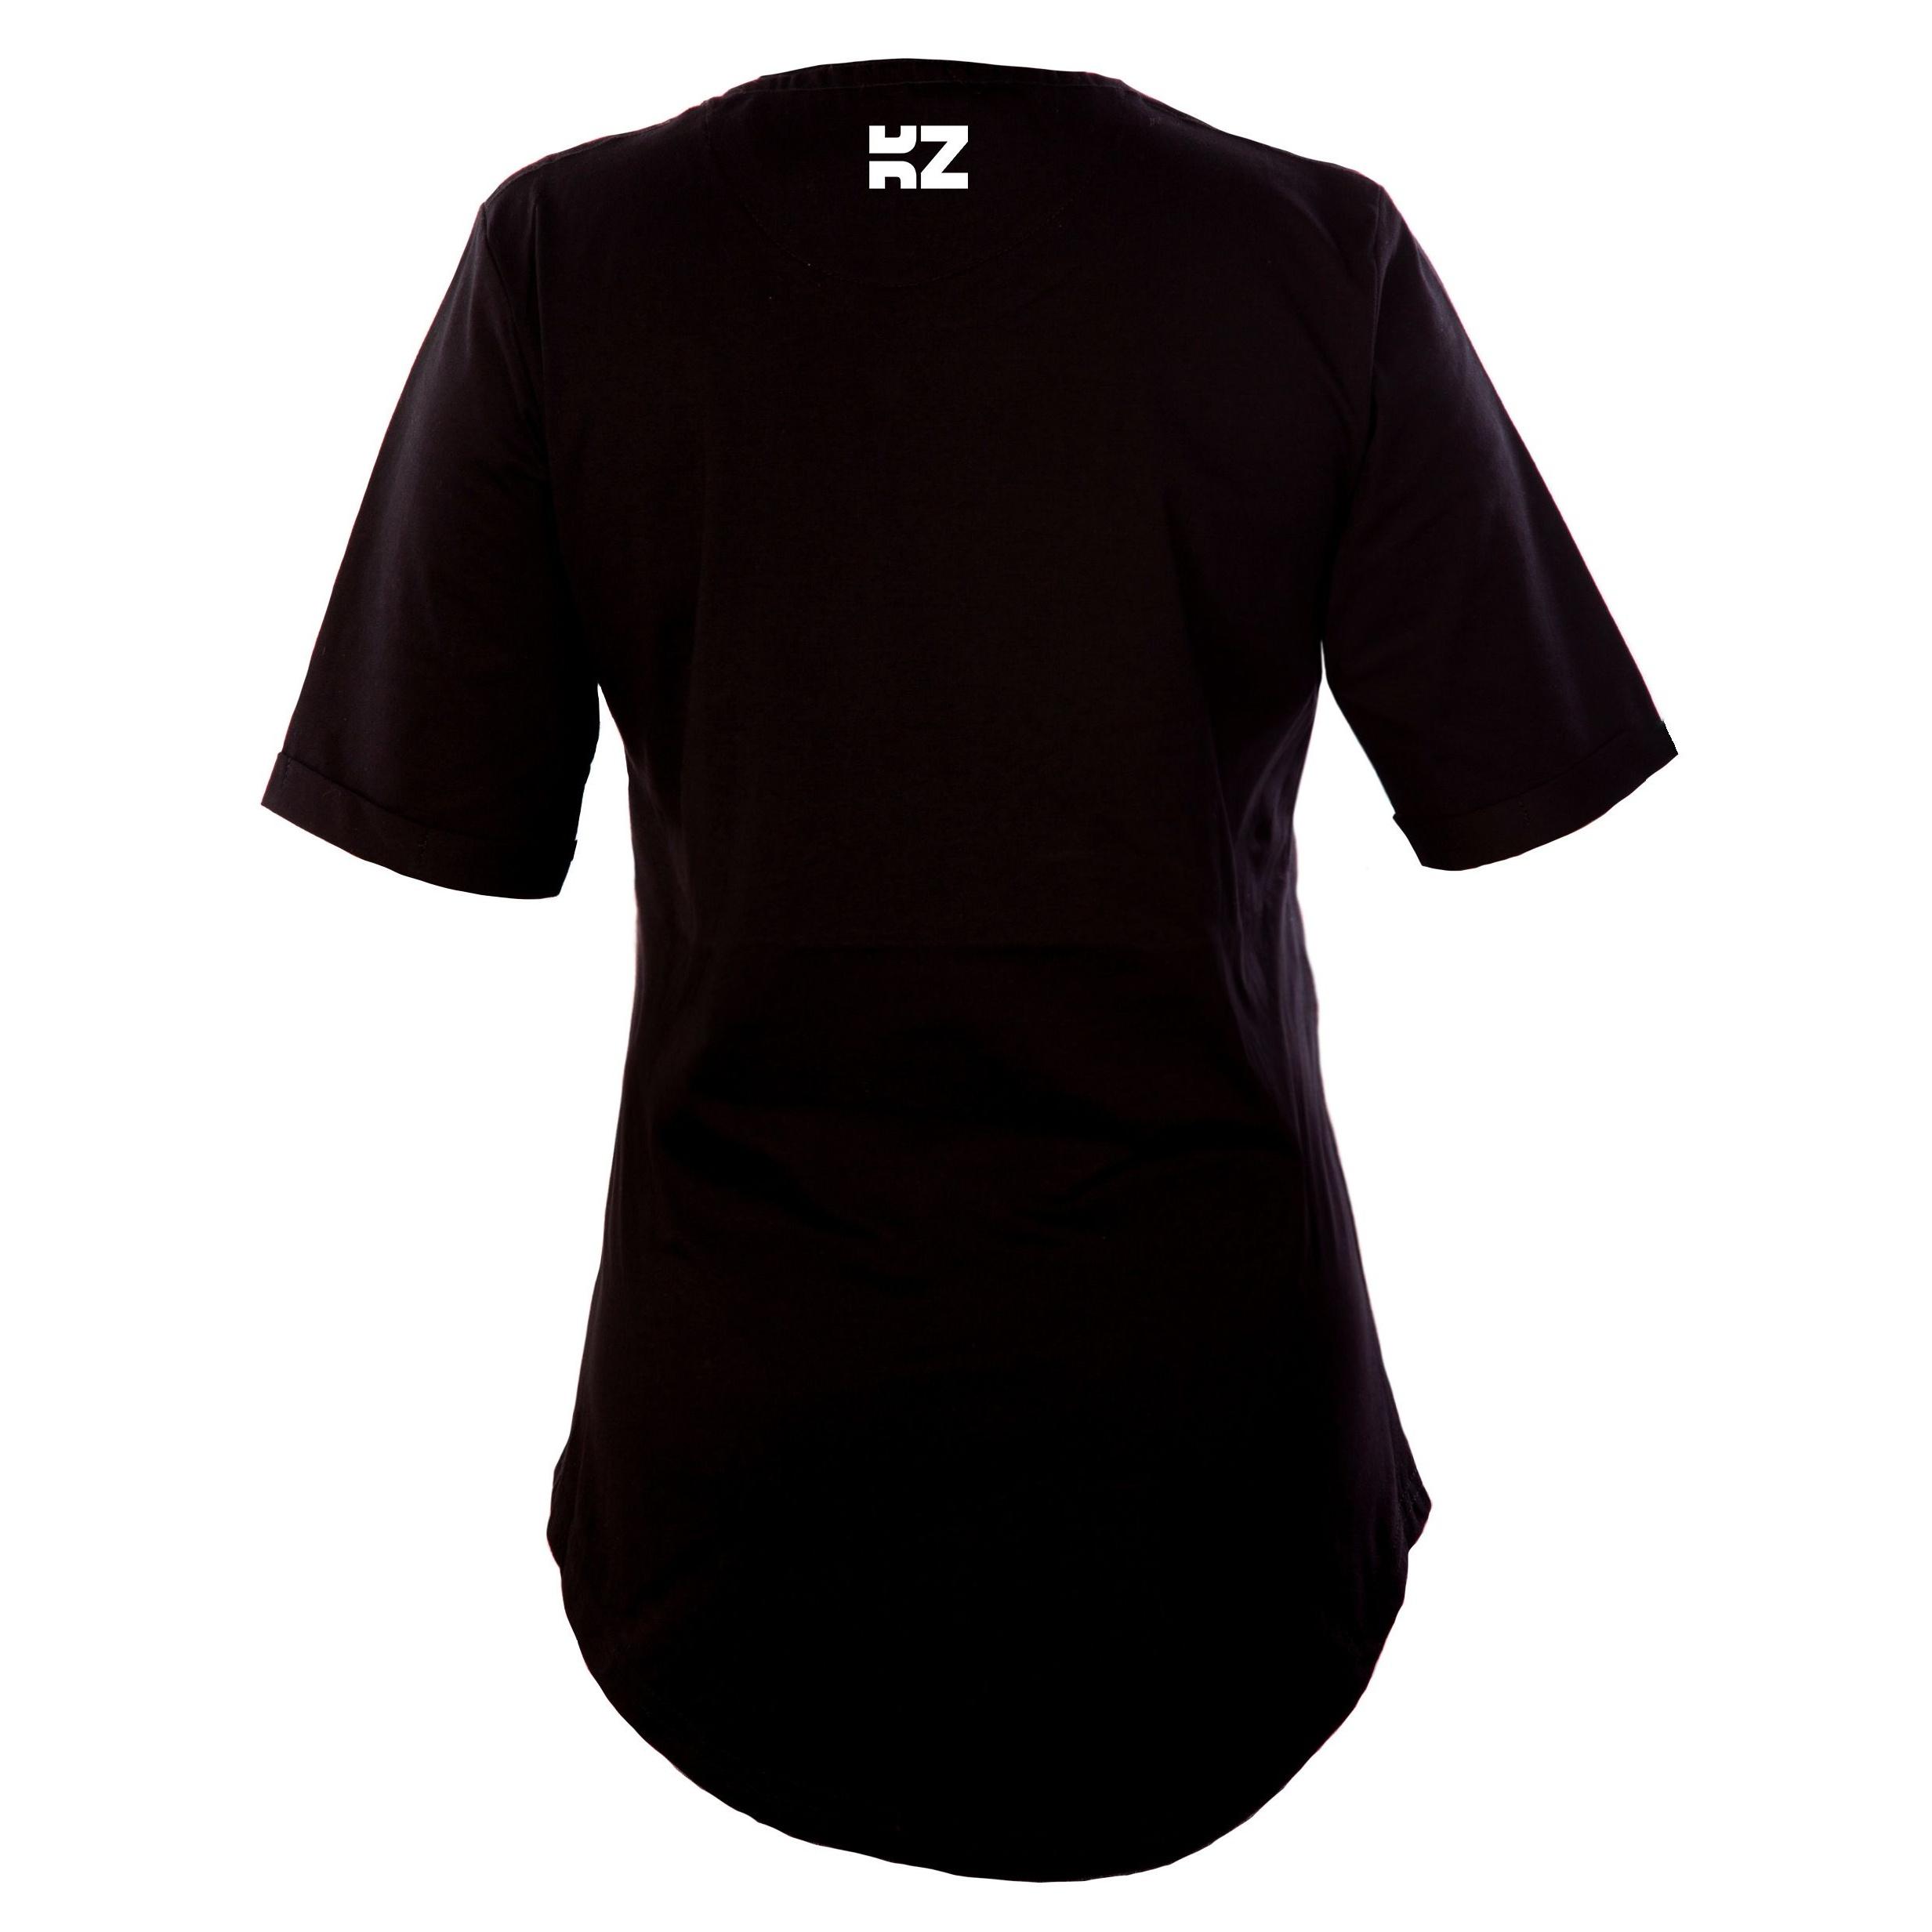 تی شرت نه کارزان کد KZ-TS-WB-0